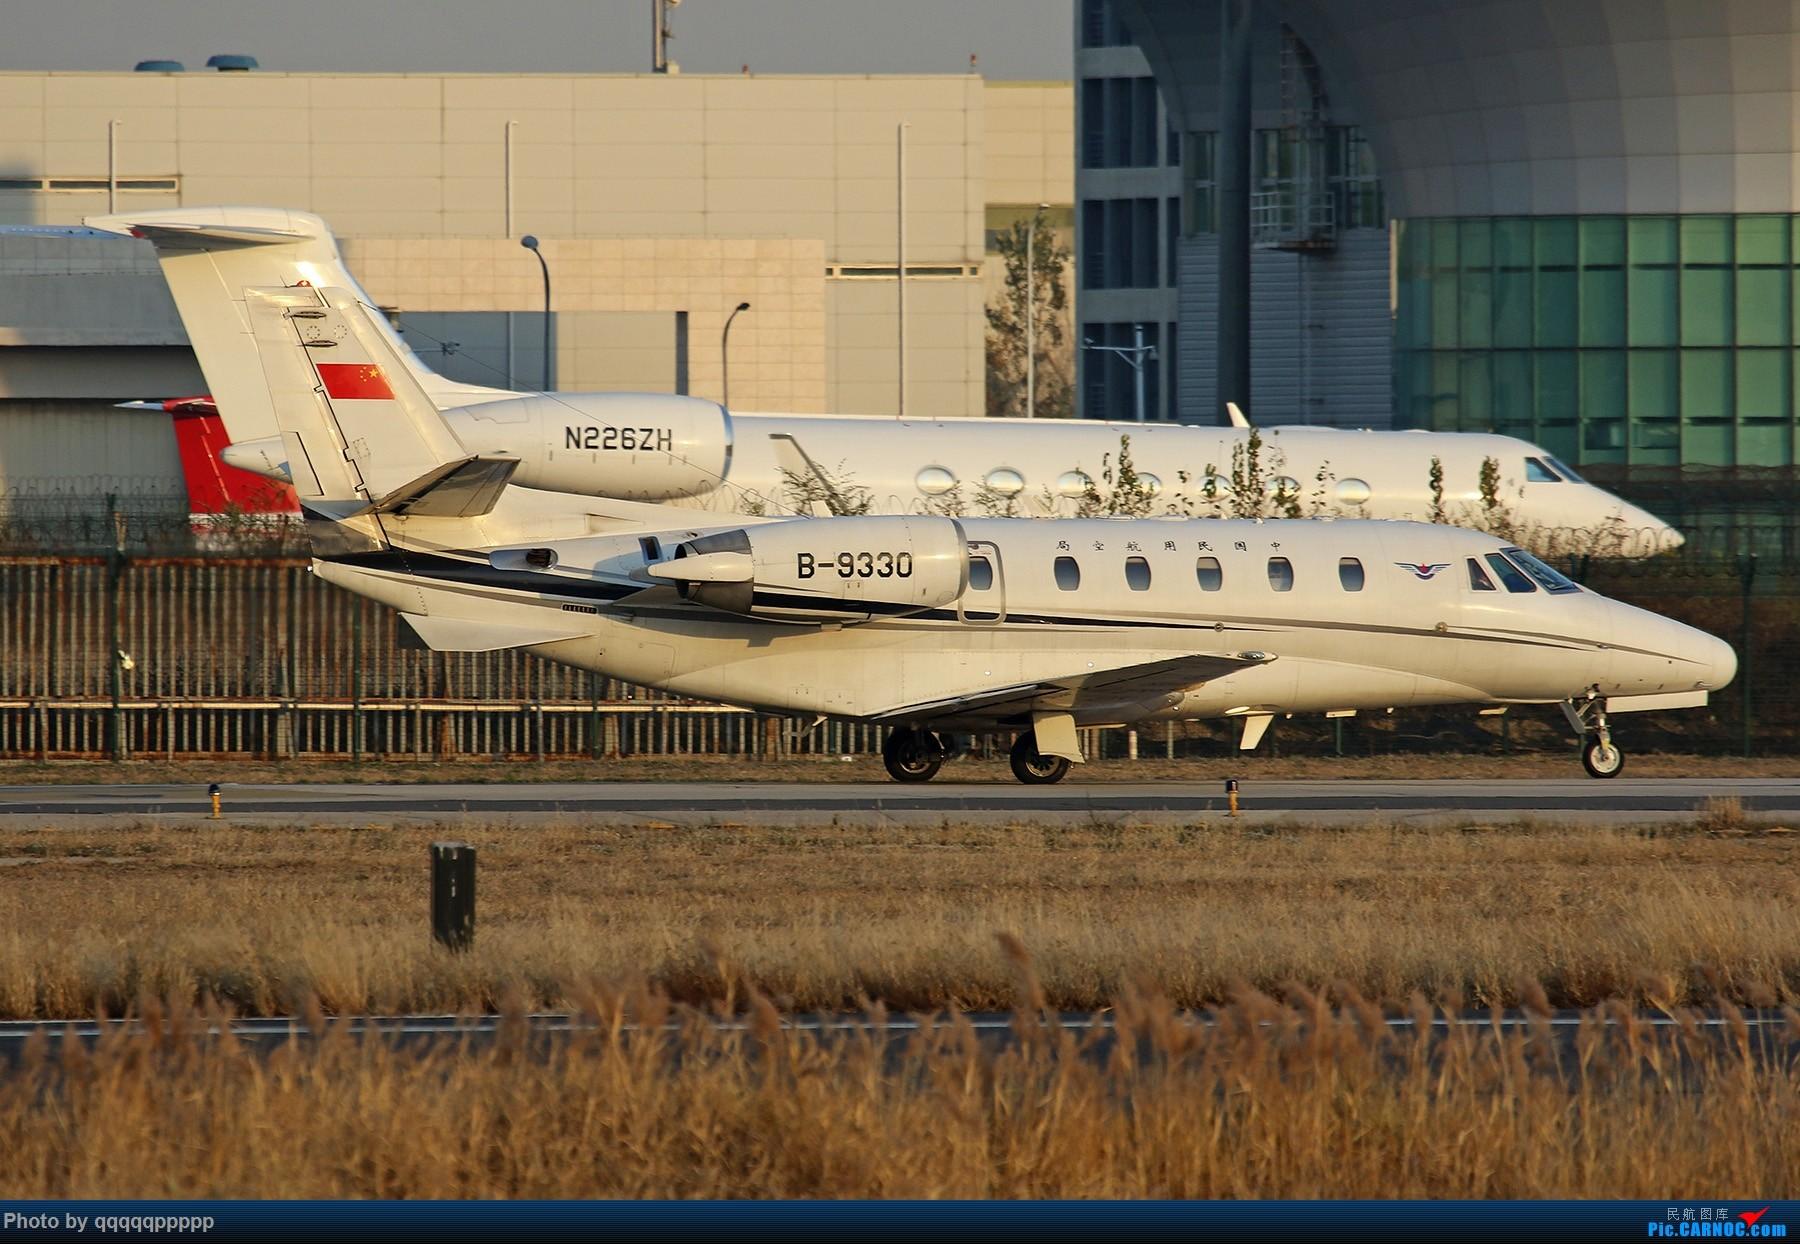 Re:[原创]~近期杂图~特别特别杂~~ CESSNA 560XLS B-9330 中国北京首都国际机场